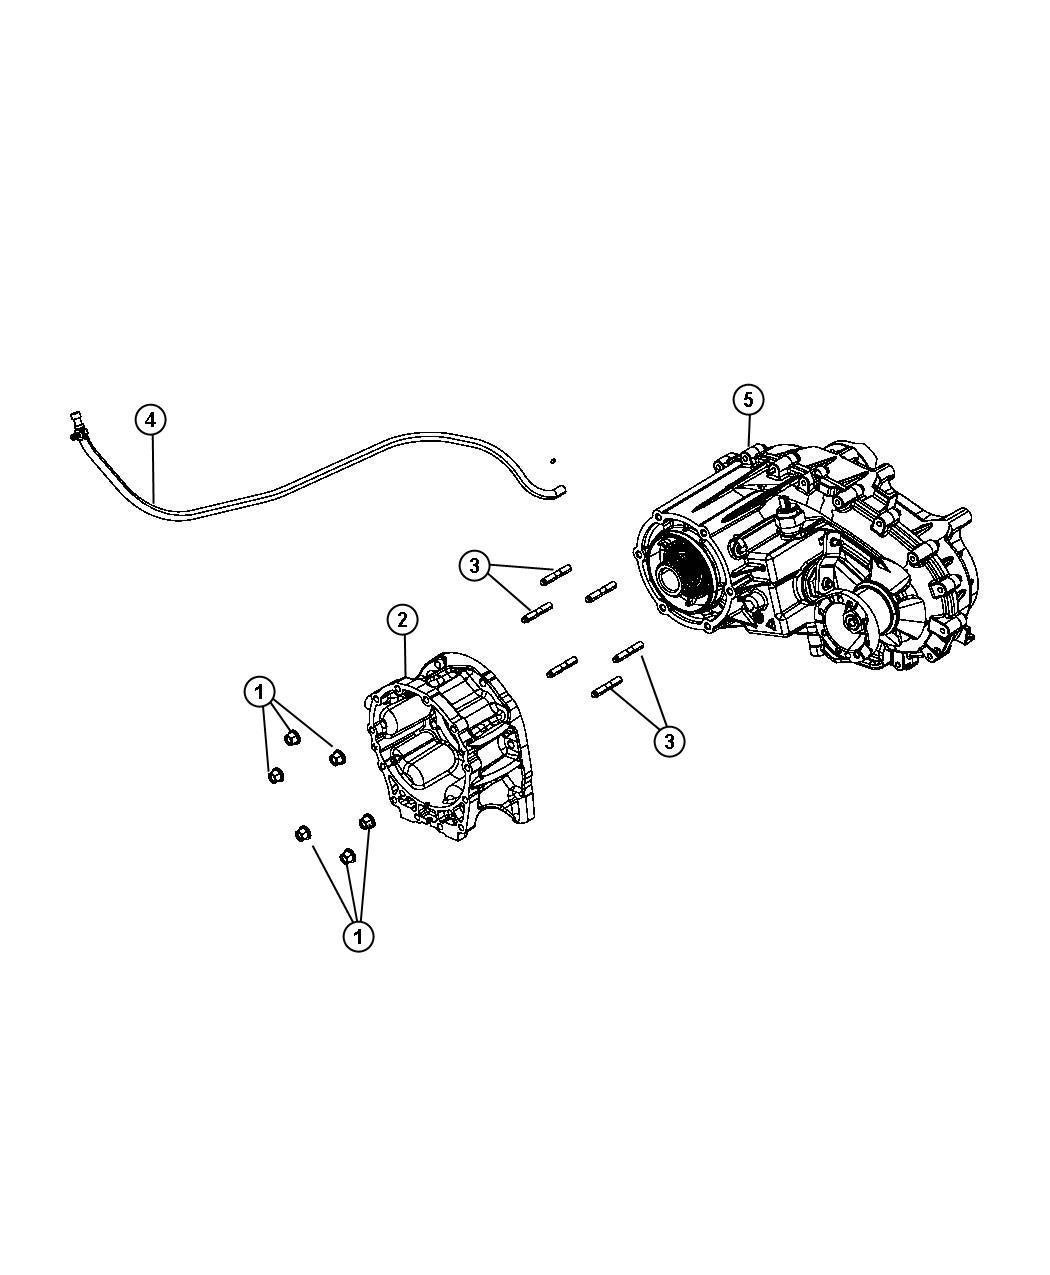 Jeep Wrangler Transfer Case Np241 Dhe Moduleman Dgj